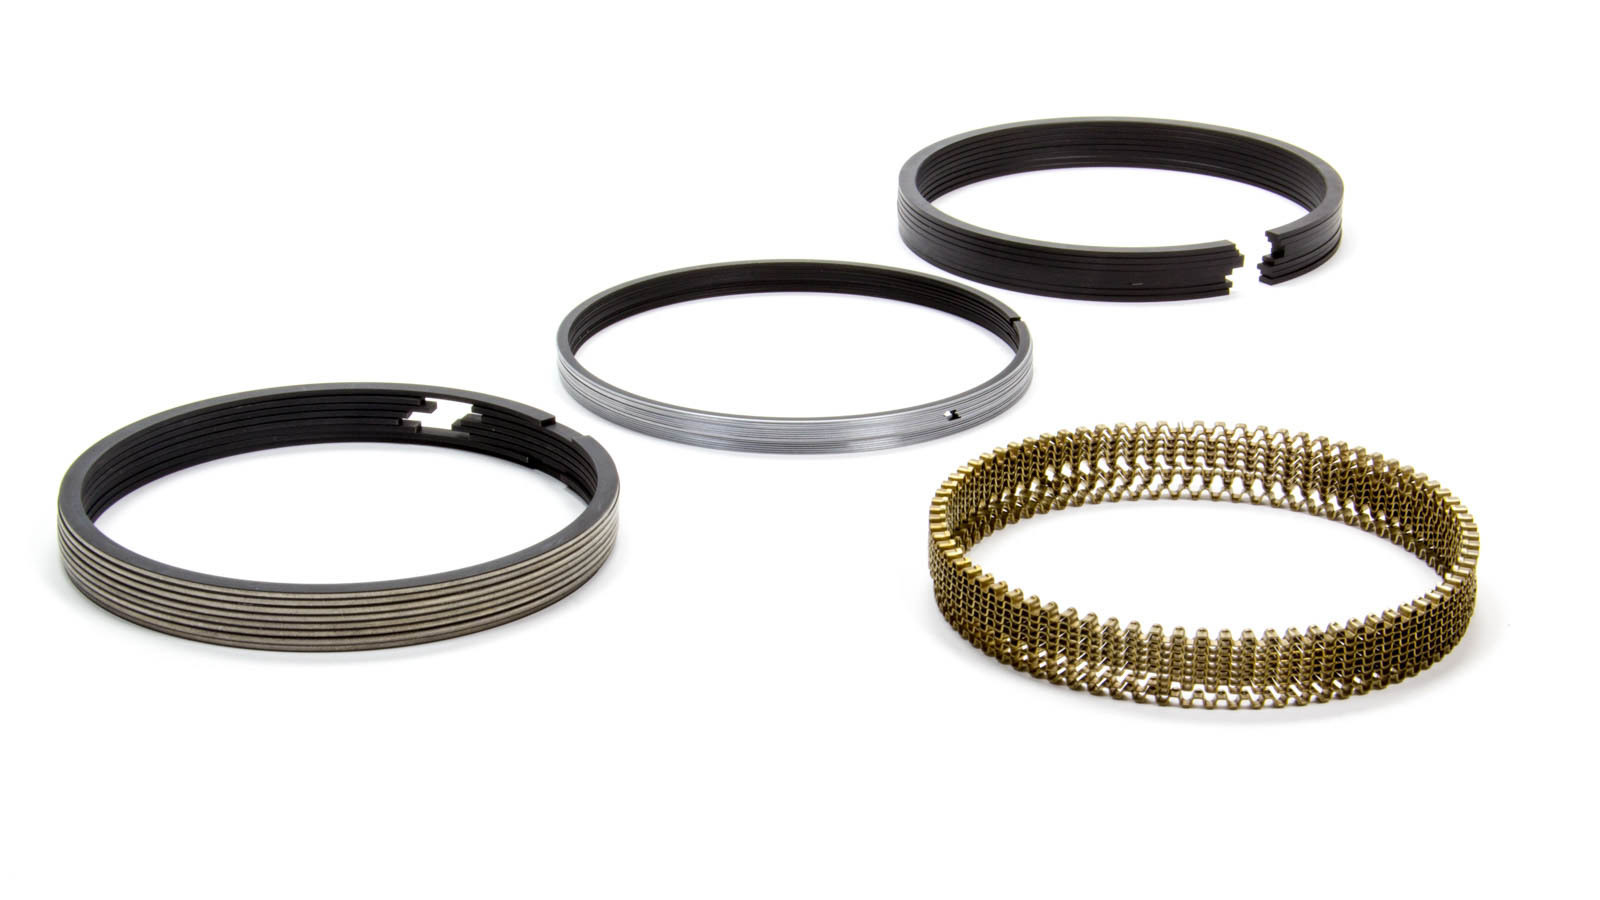 Piston Ring Set 4.025 Classic 2.0 1.5 4.0mm